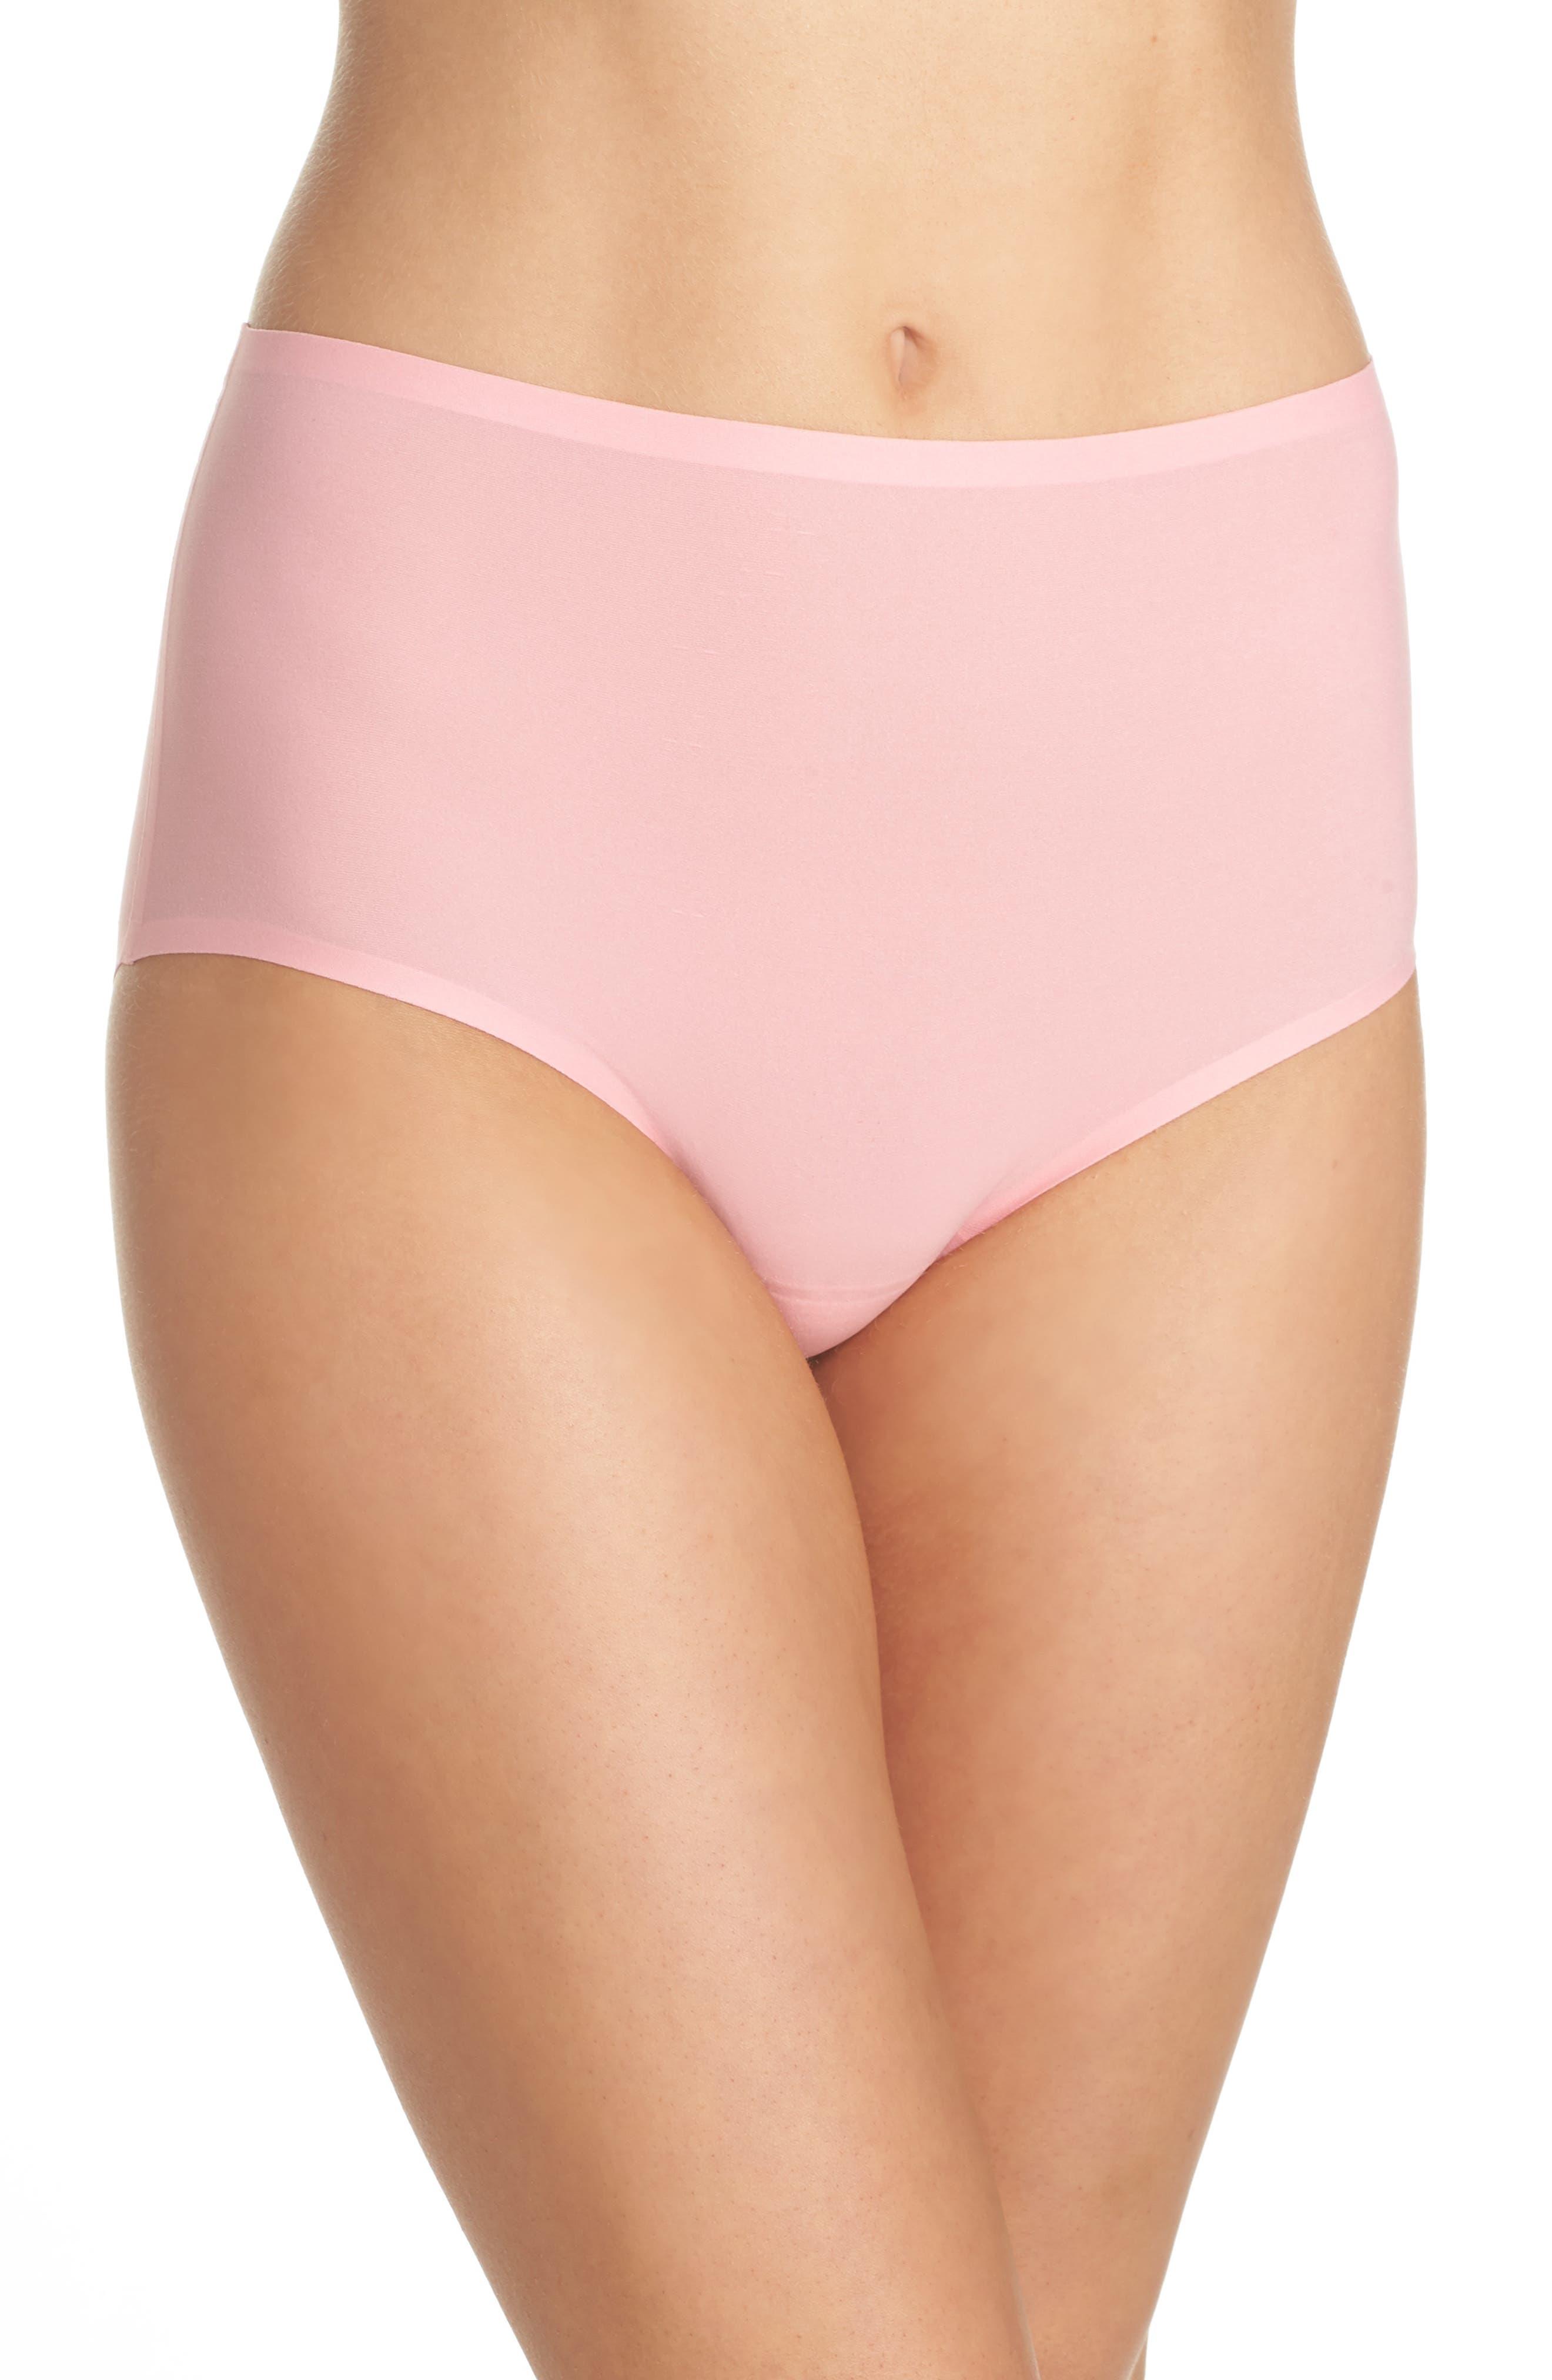 Soft Stretch High Waist Seamless Briefs,                         Main,                         color, Pink Lemonade